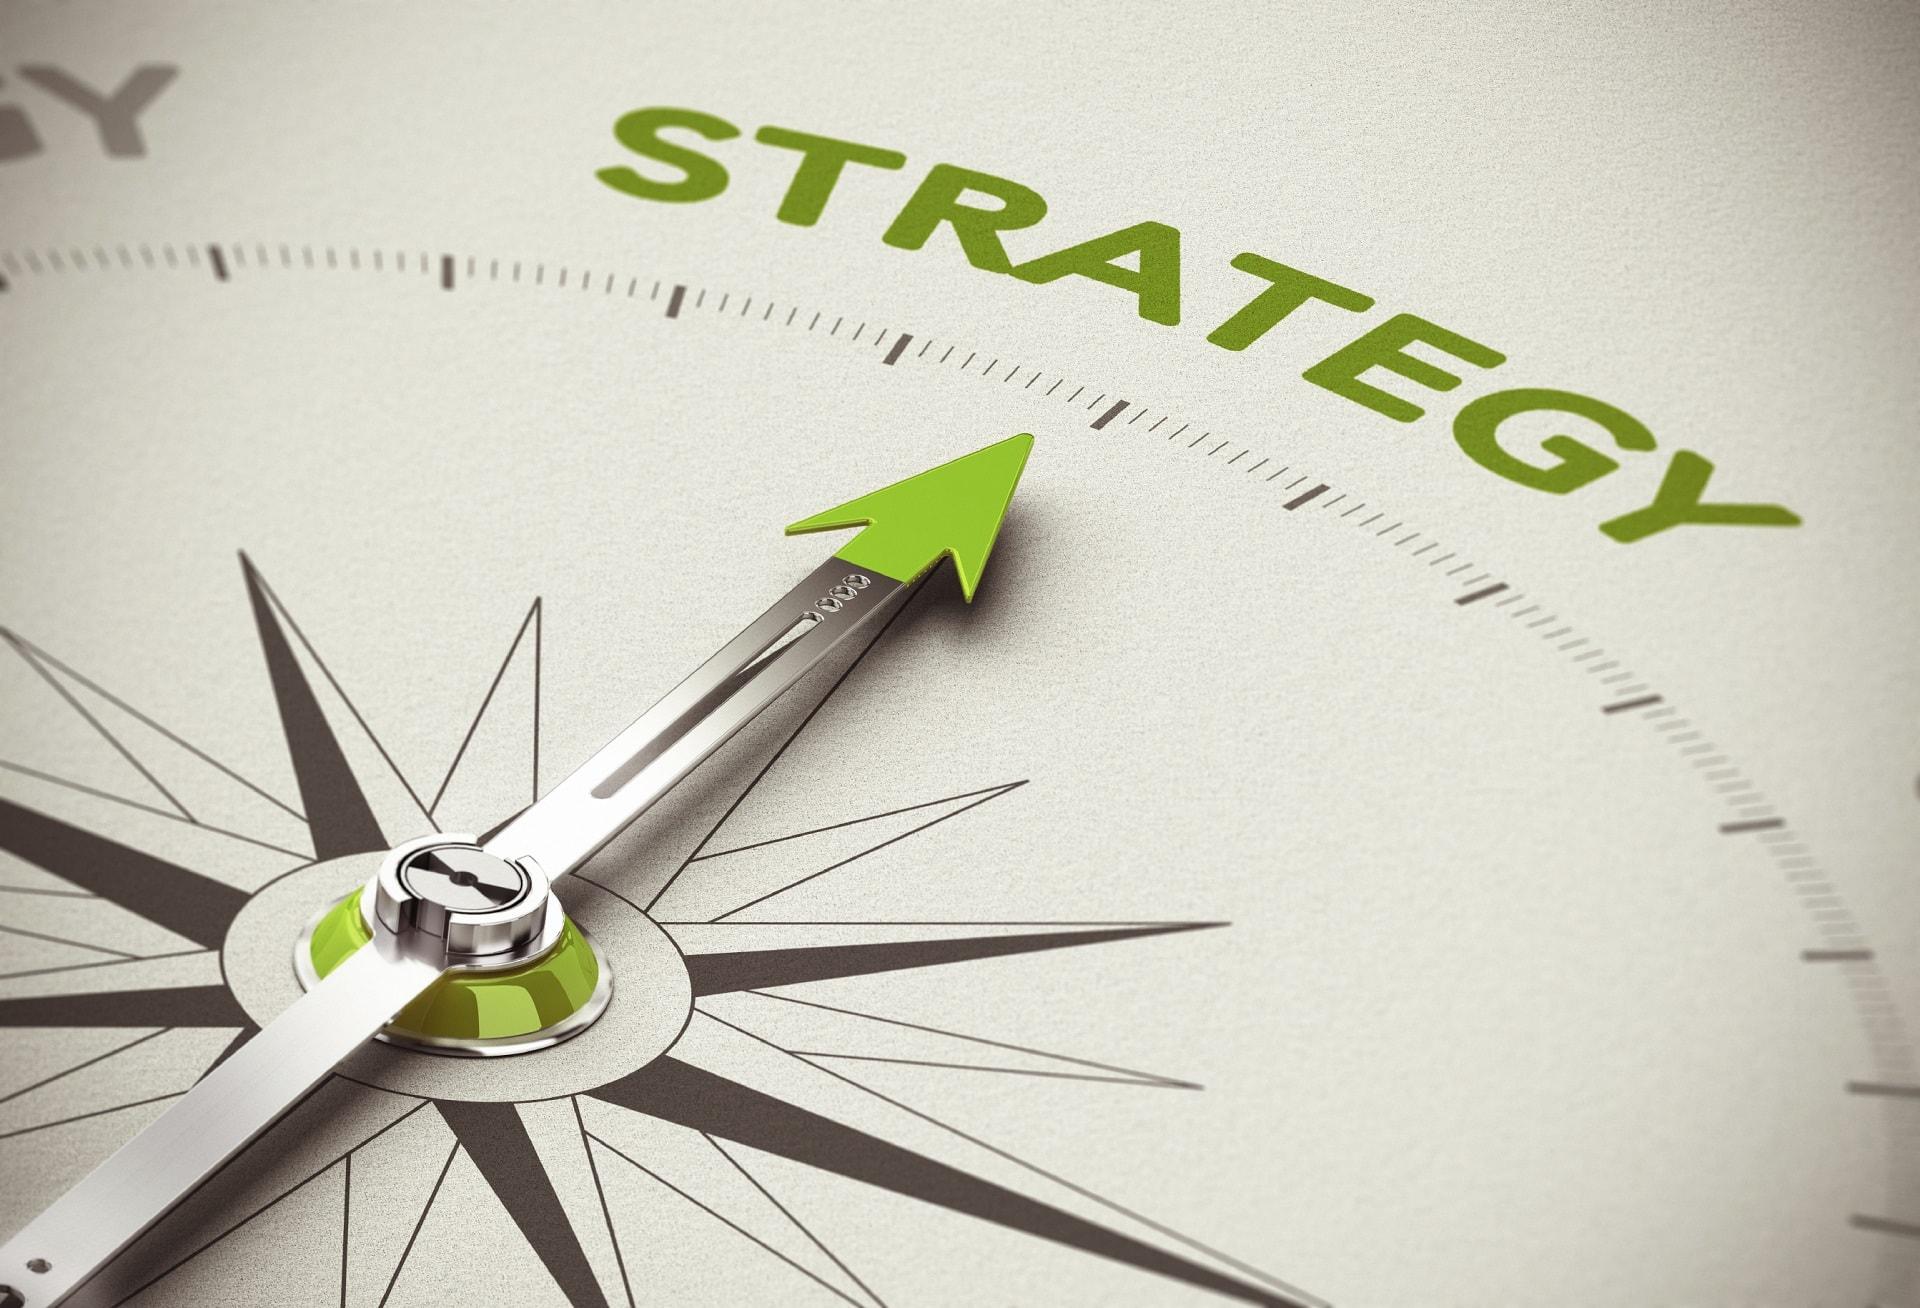 10 шагов к созданию smm-стратегии